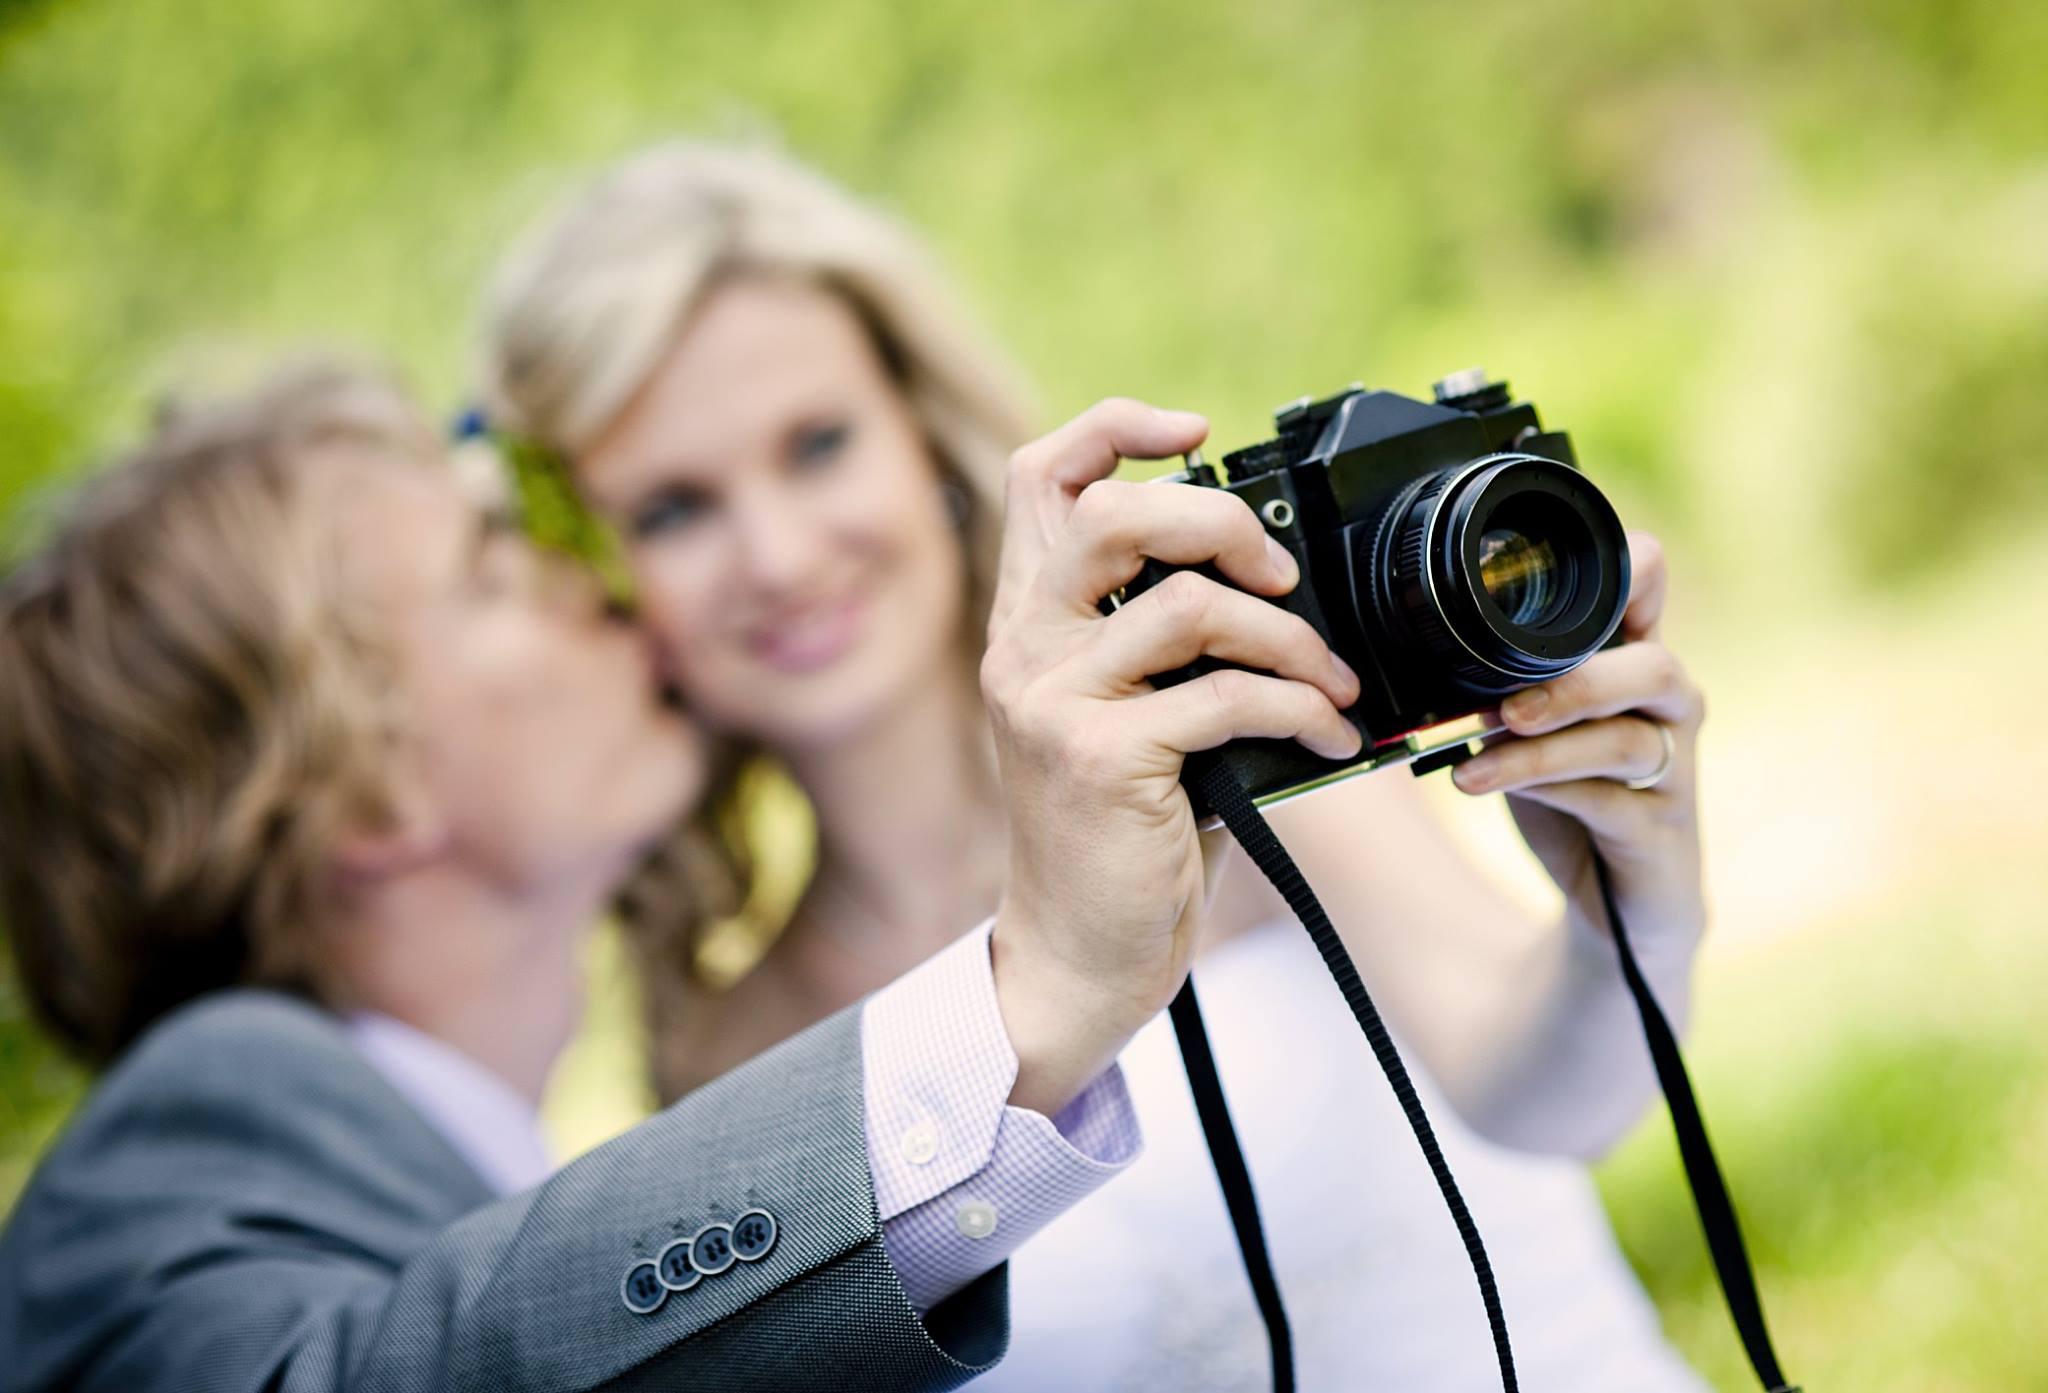 صور عريس وعروسه يوم الزفاف 12 صور عريس وعروسه يوم الزفاف